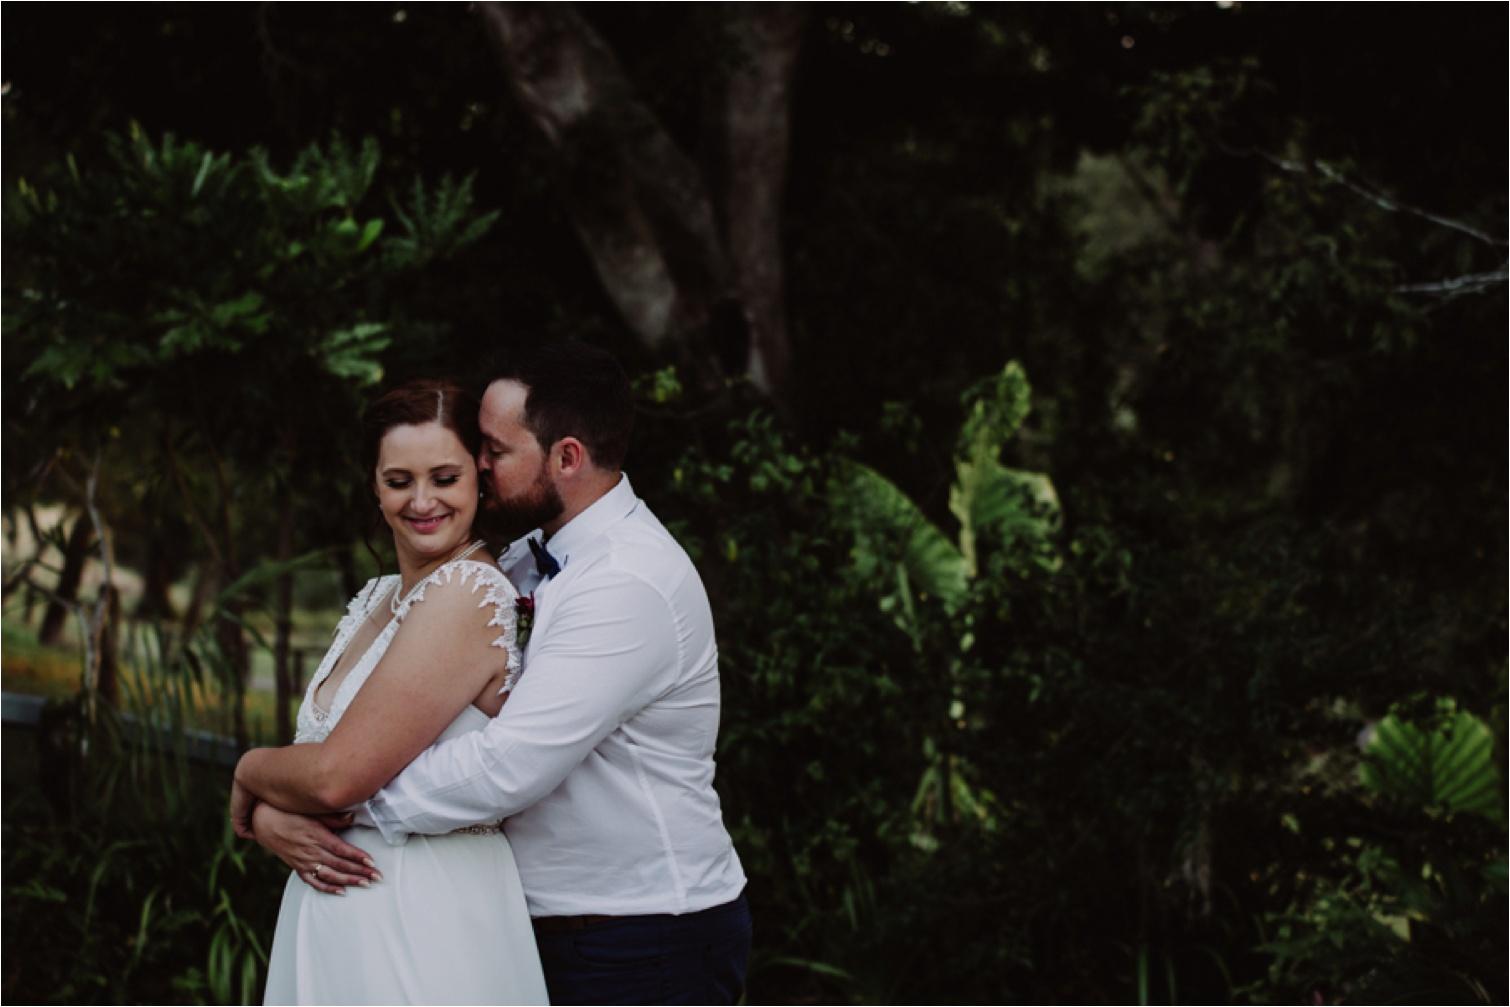 Gold Coast Wedding Photography - Riverwood Wedding_0064.jpg